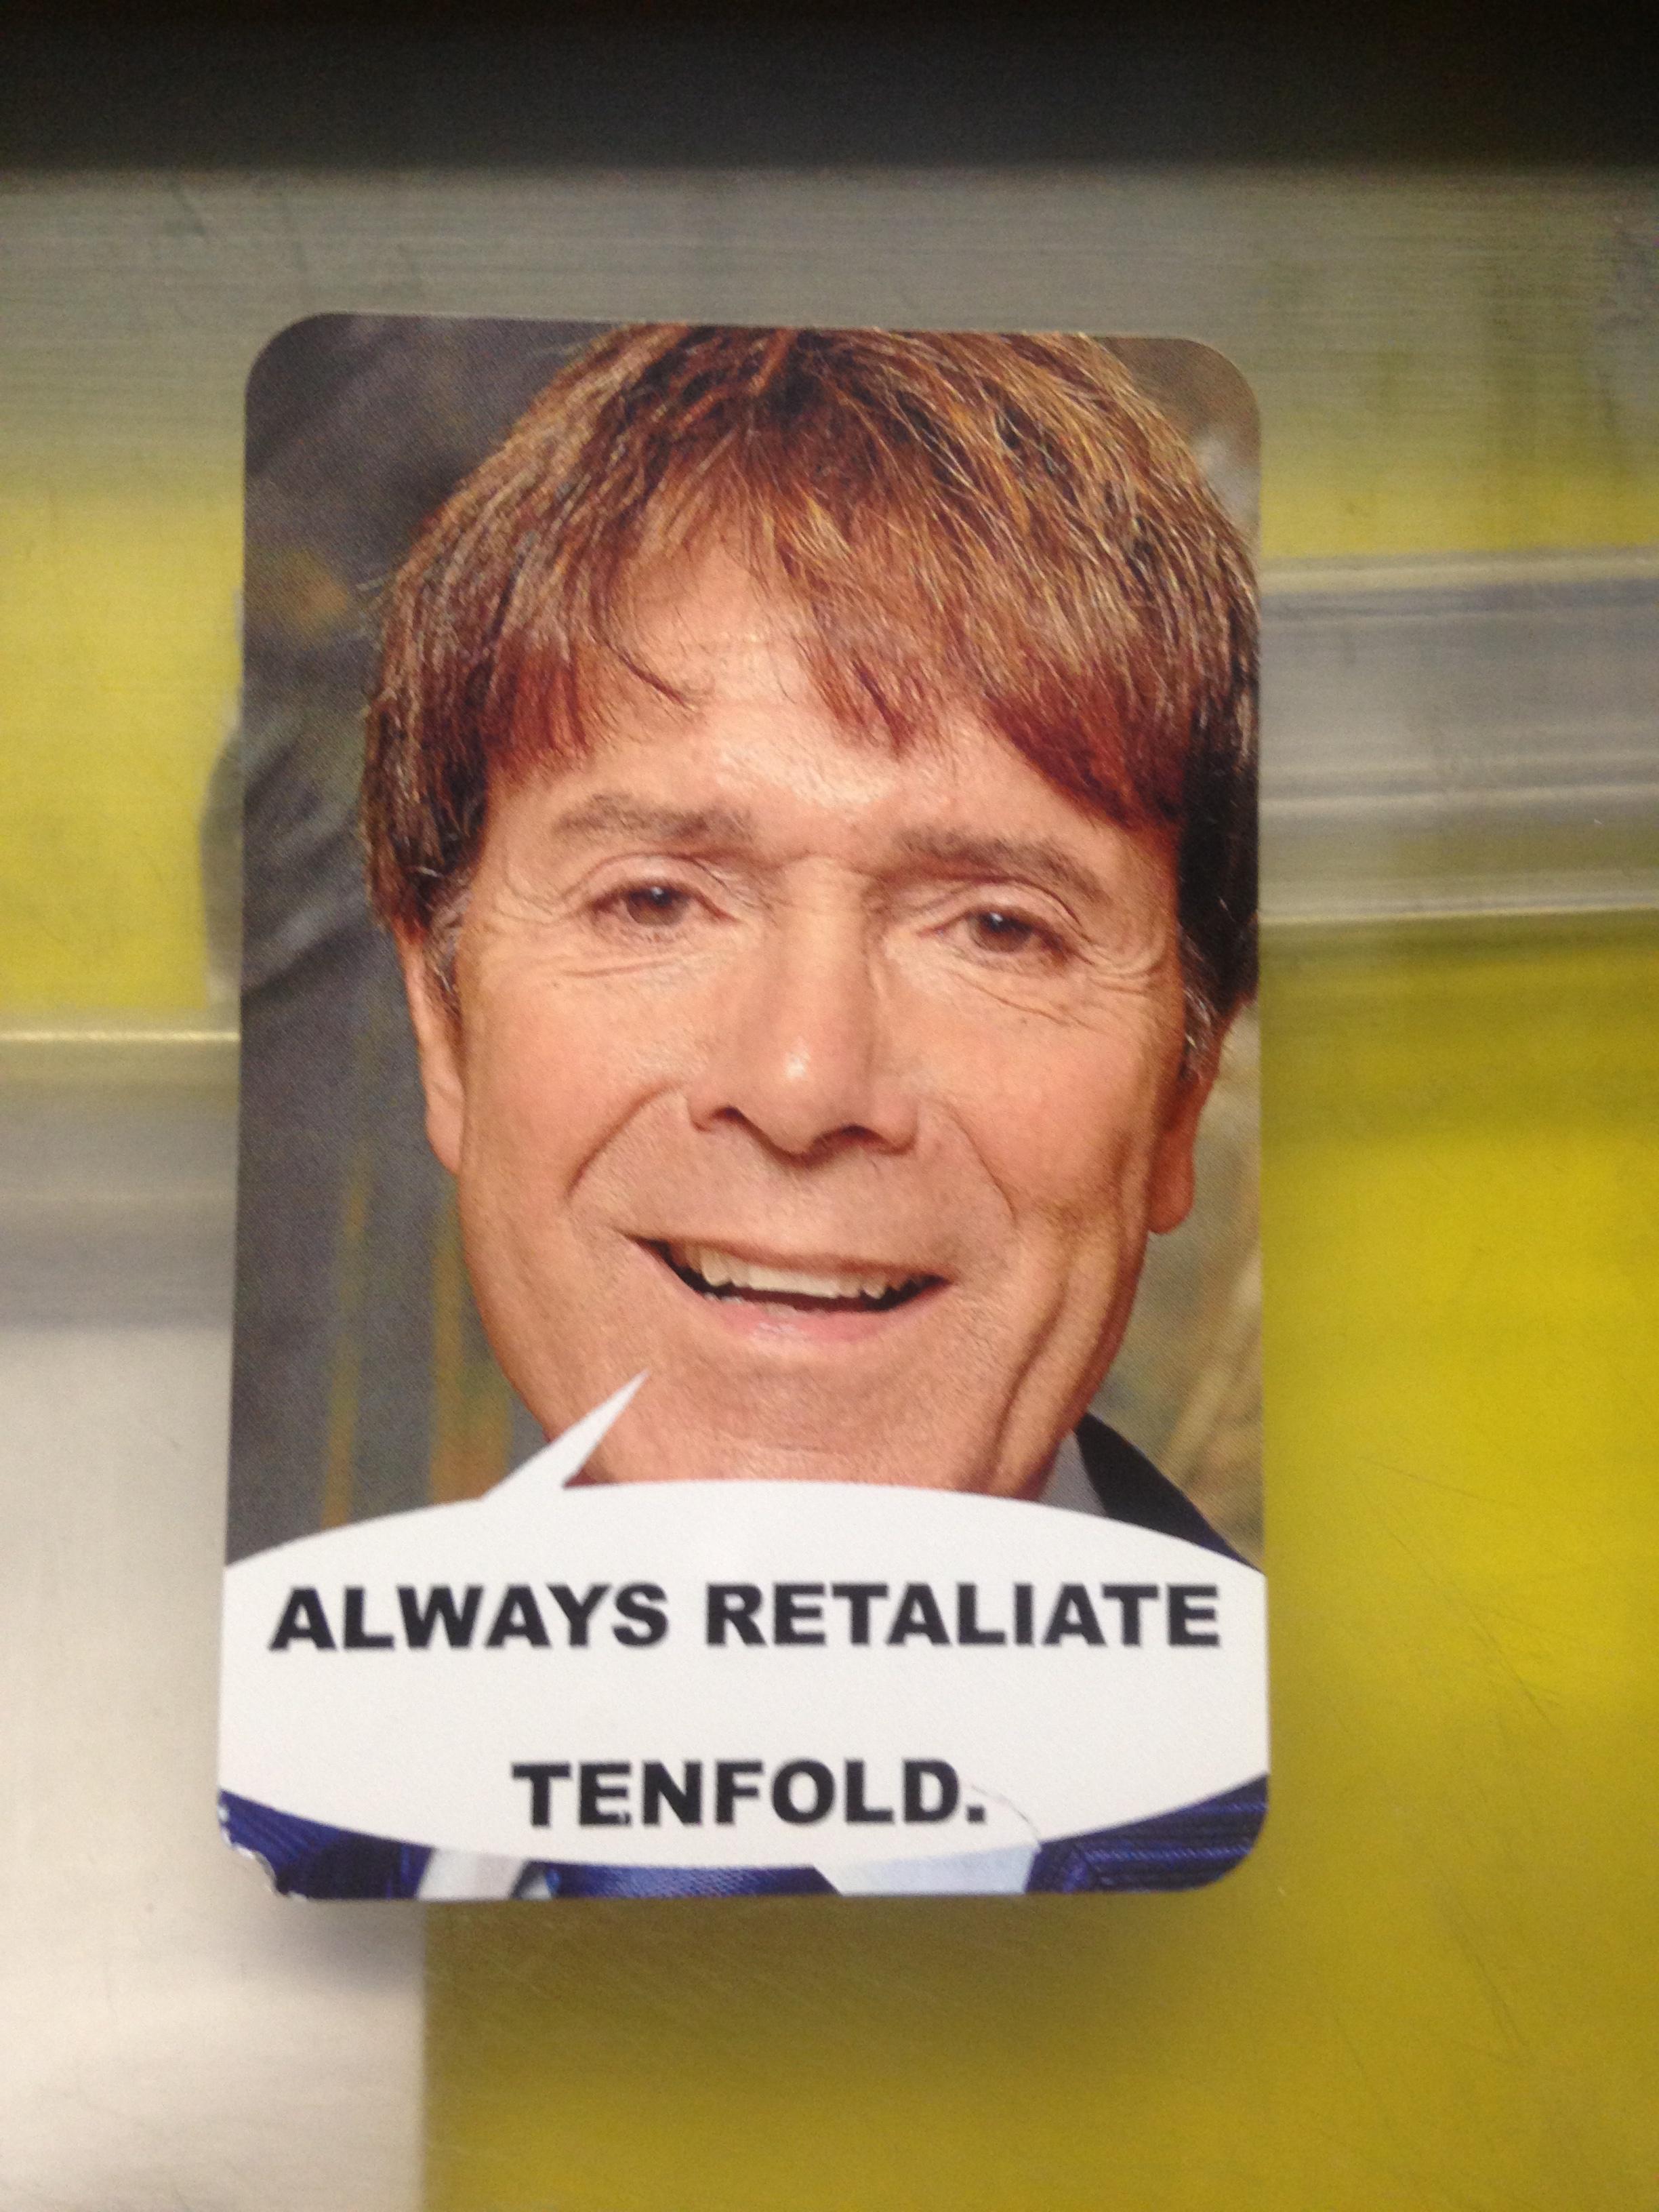 always retaliate tenfold